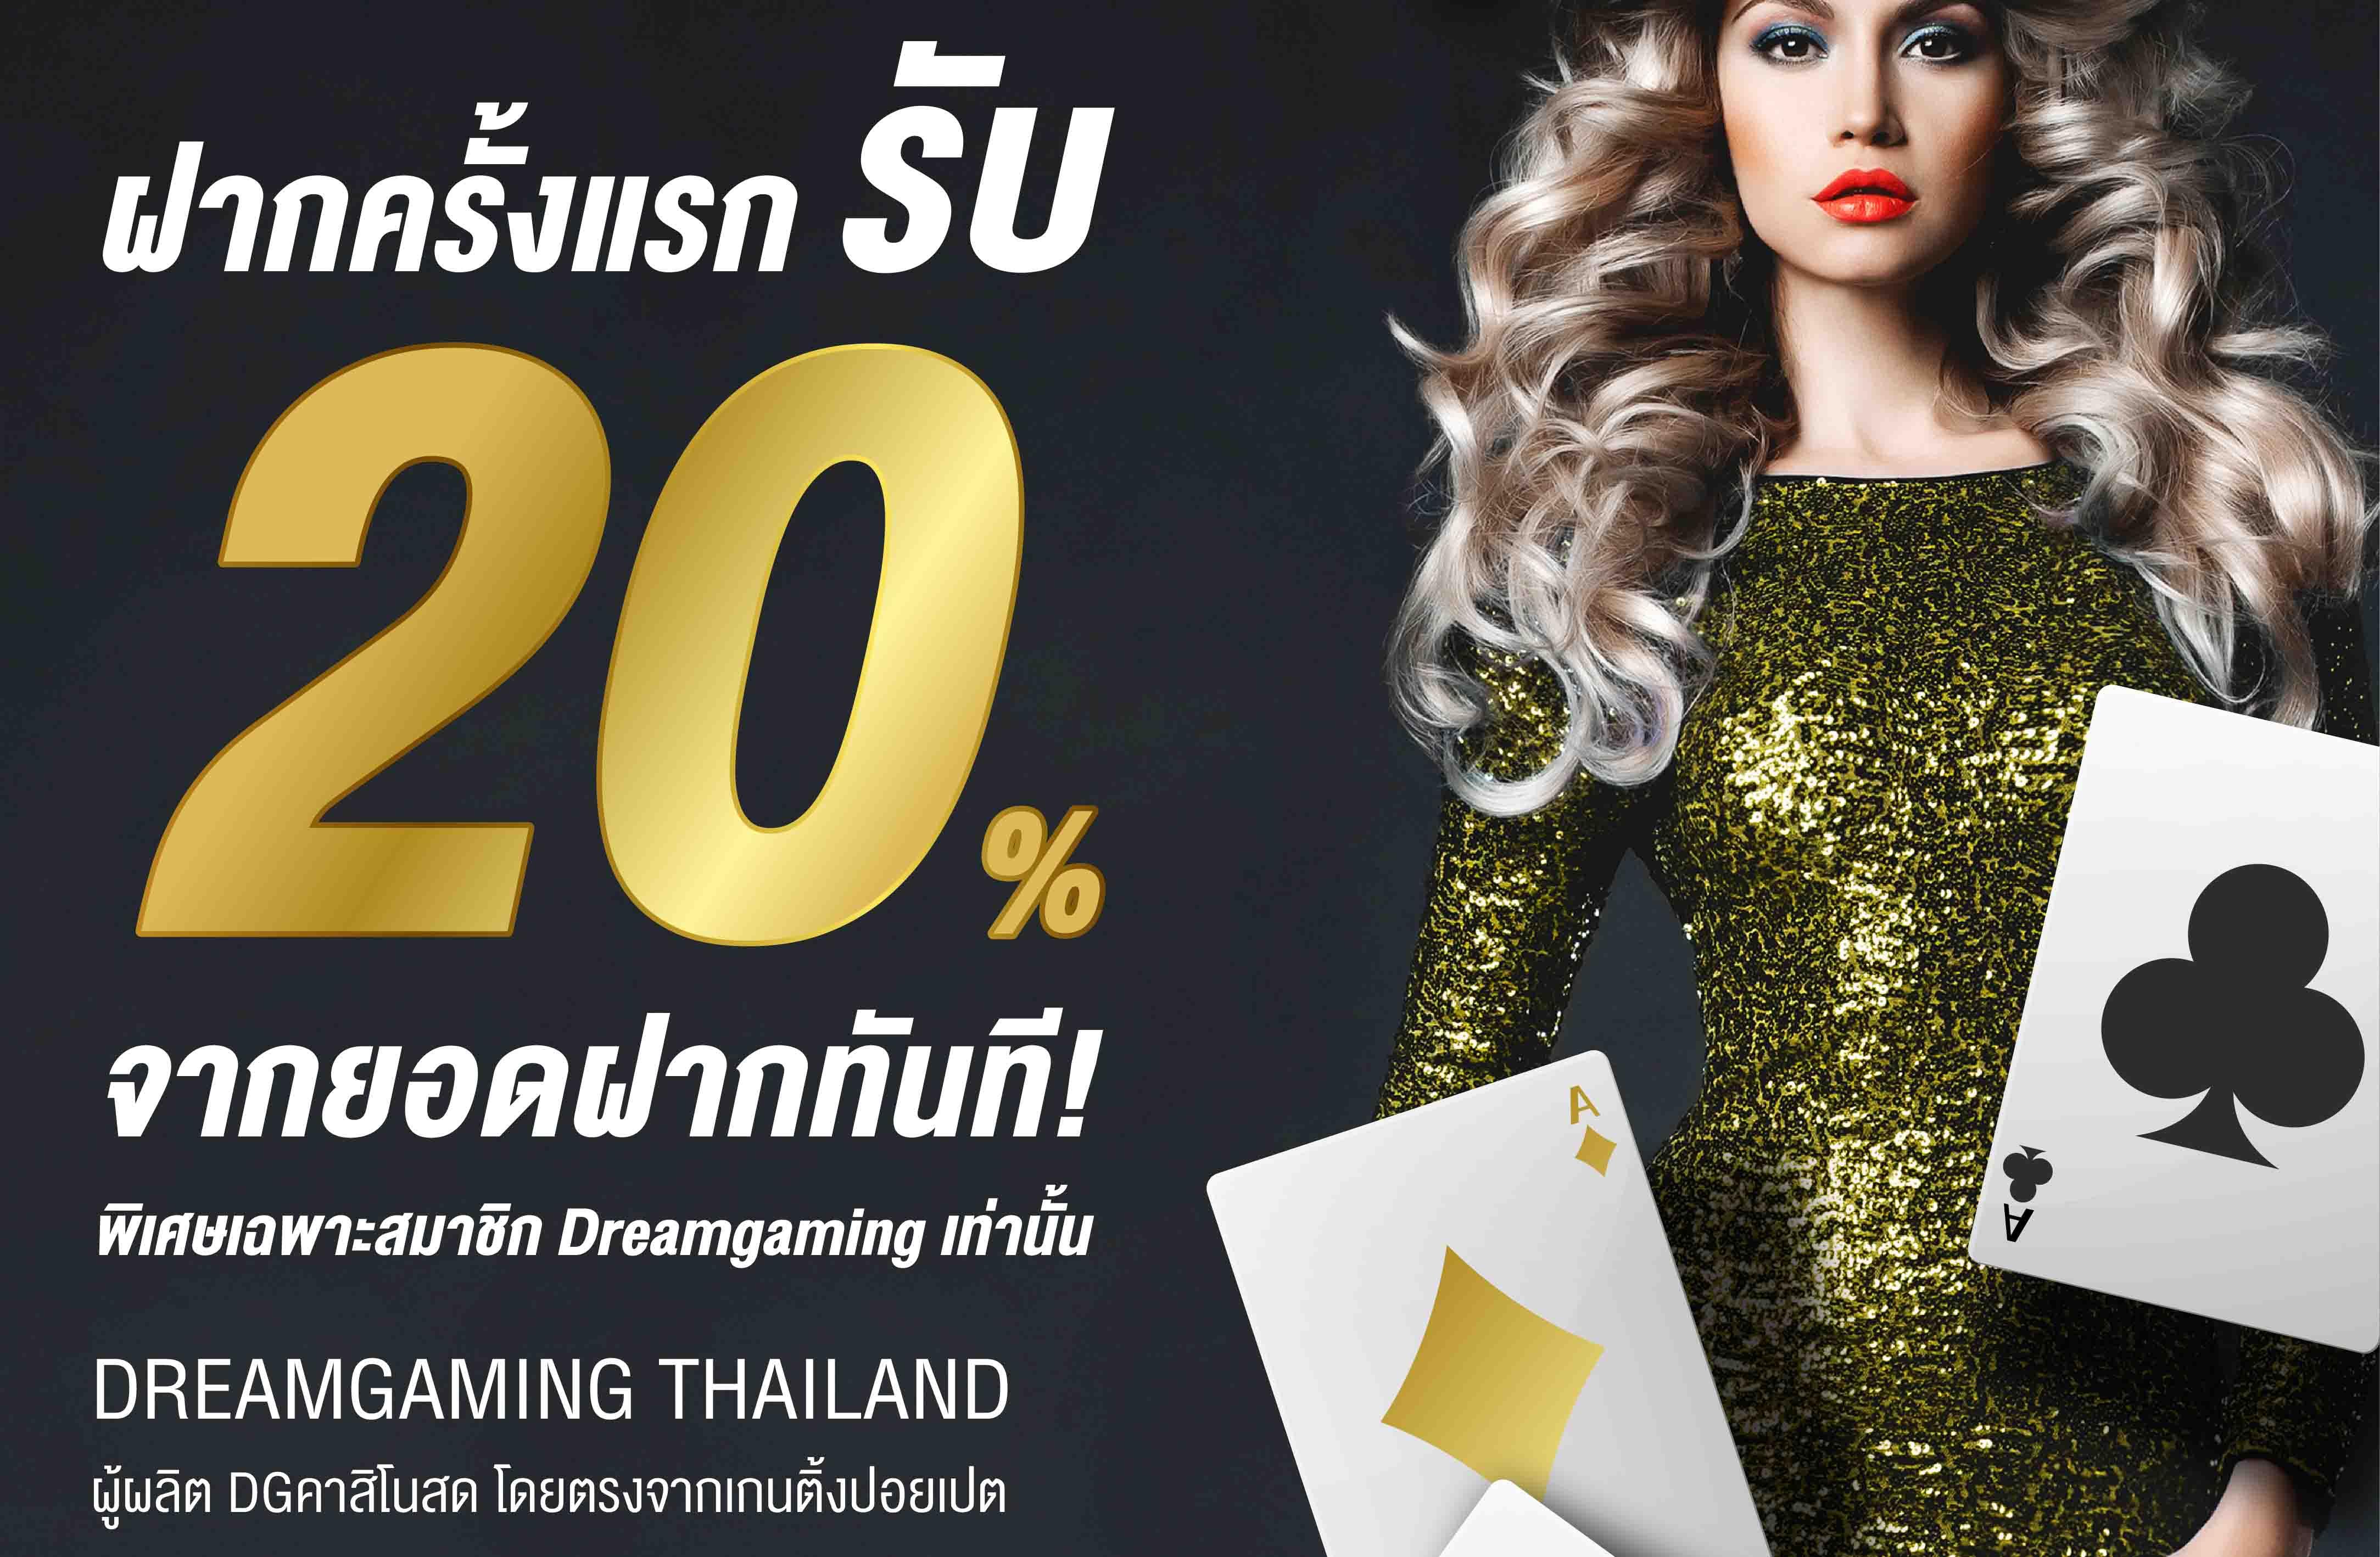 [DG casino] โปรโมชั่น คาสิโนออนไลน์ ฝากครั้งแรก รับ 20% จากยอดฝากทันที